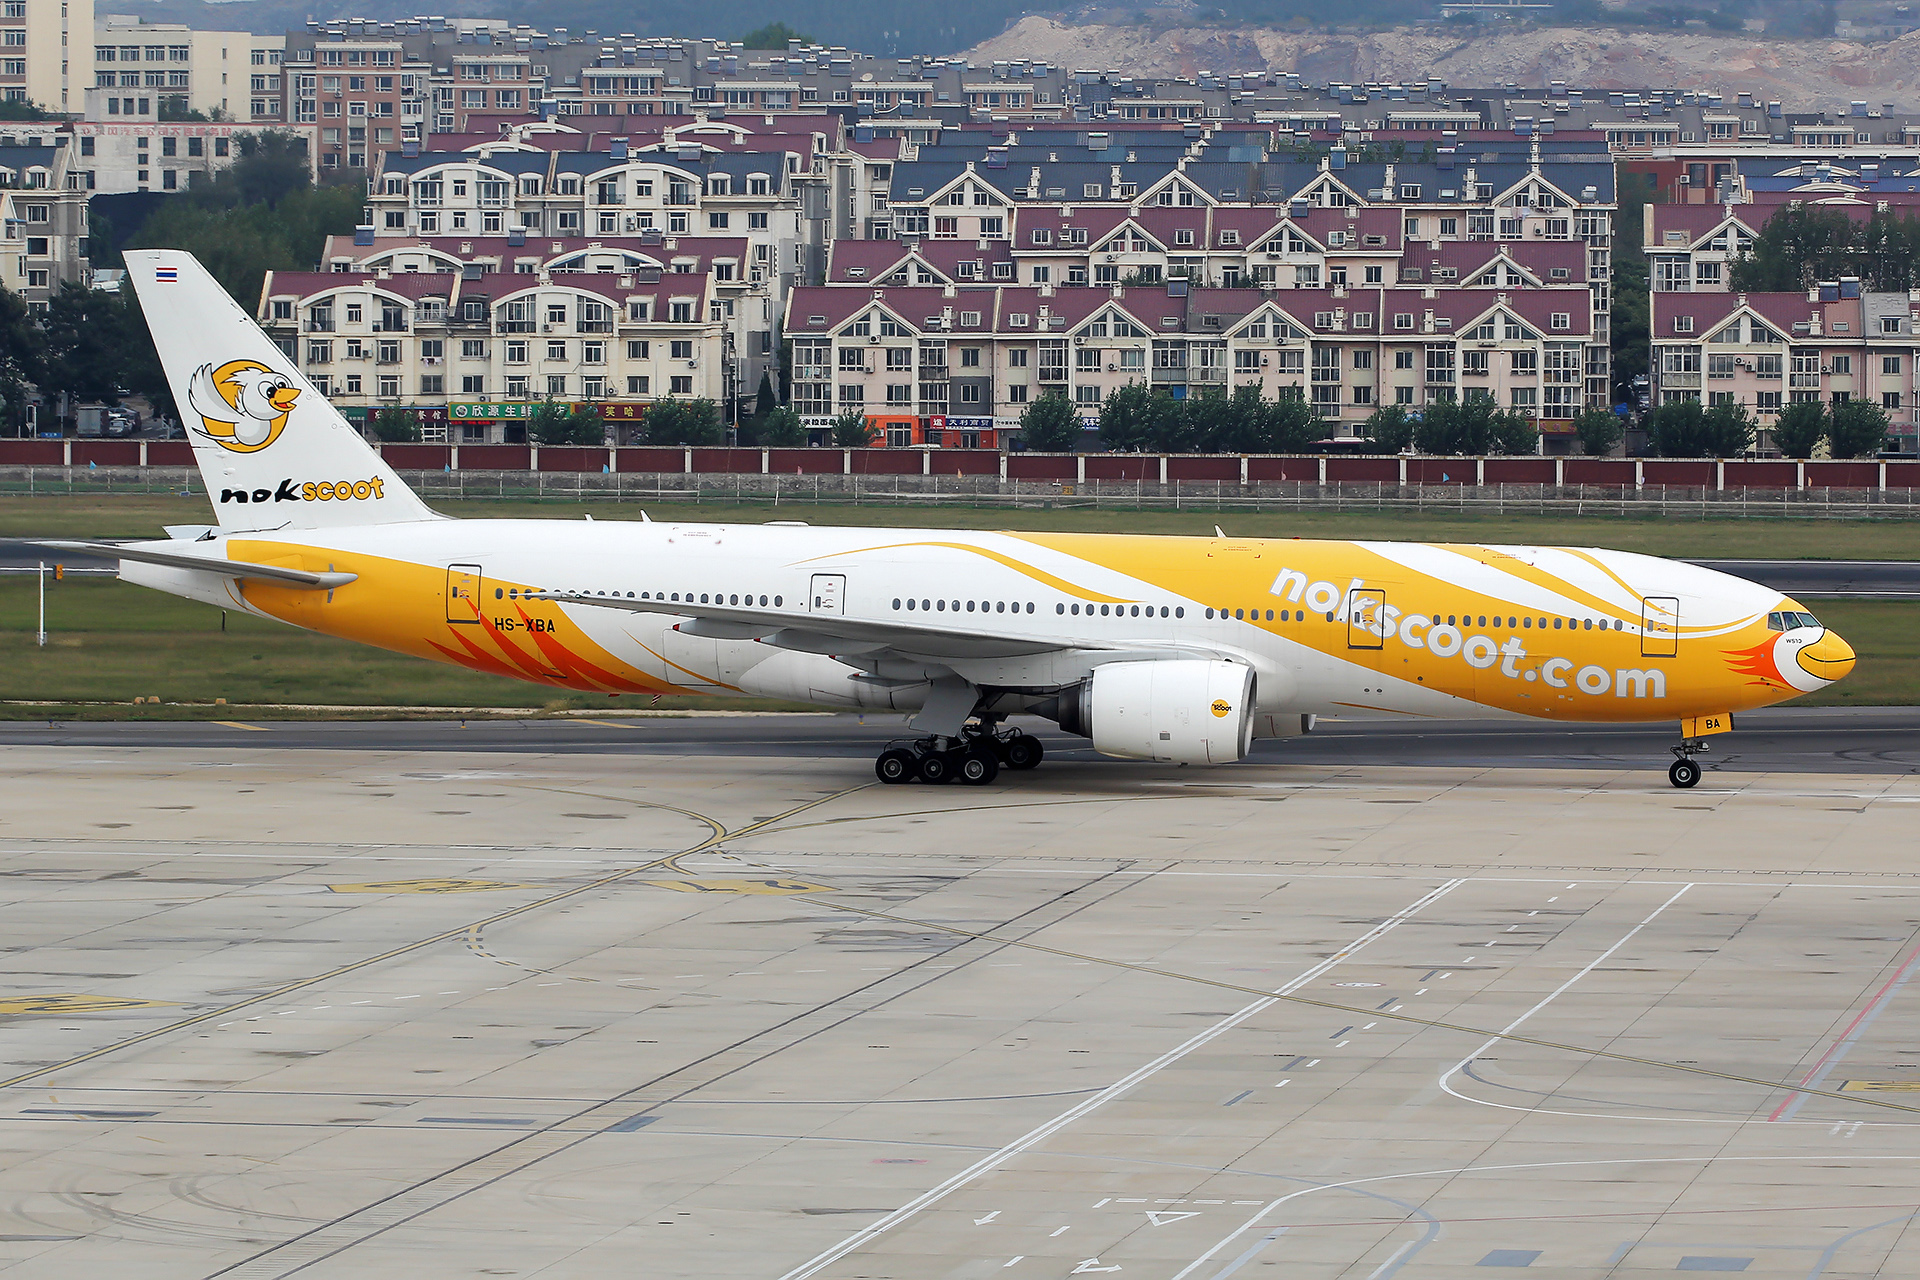 Re:[原创][DLC]。。。酷鸟首航,落地反推未开,跑道口脱离。。。 BOEING 767-200ER HS-XBA 中国大连国际机场